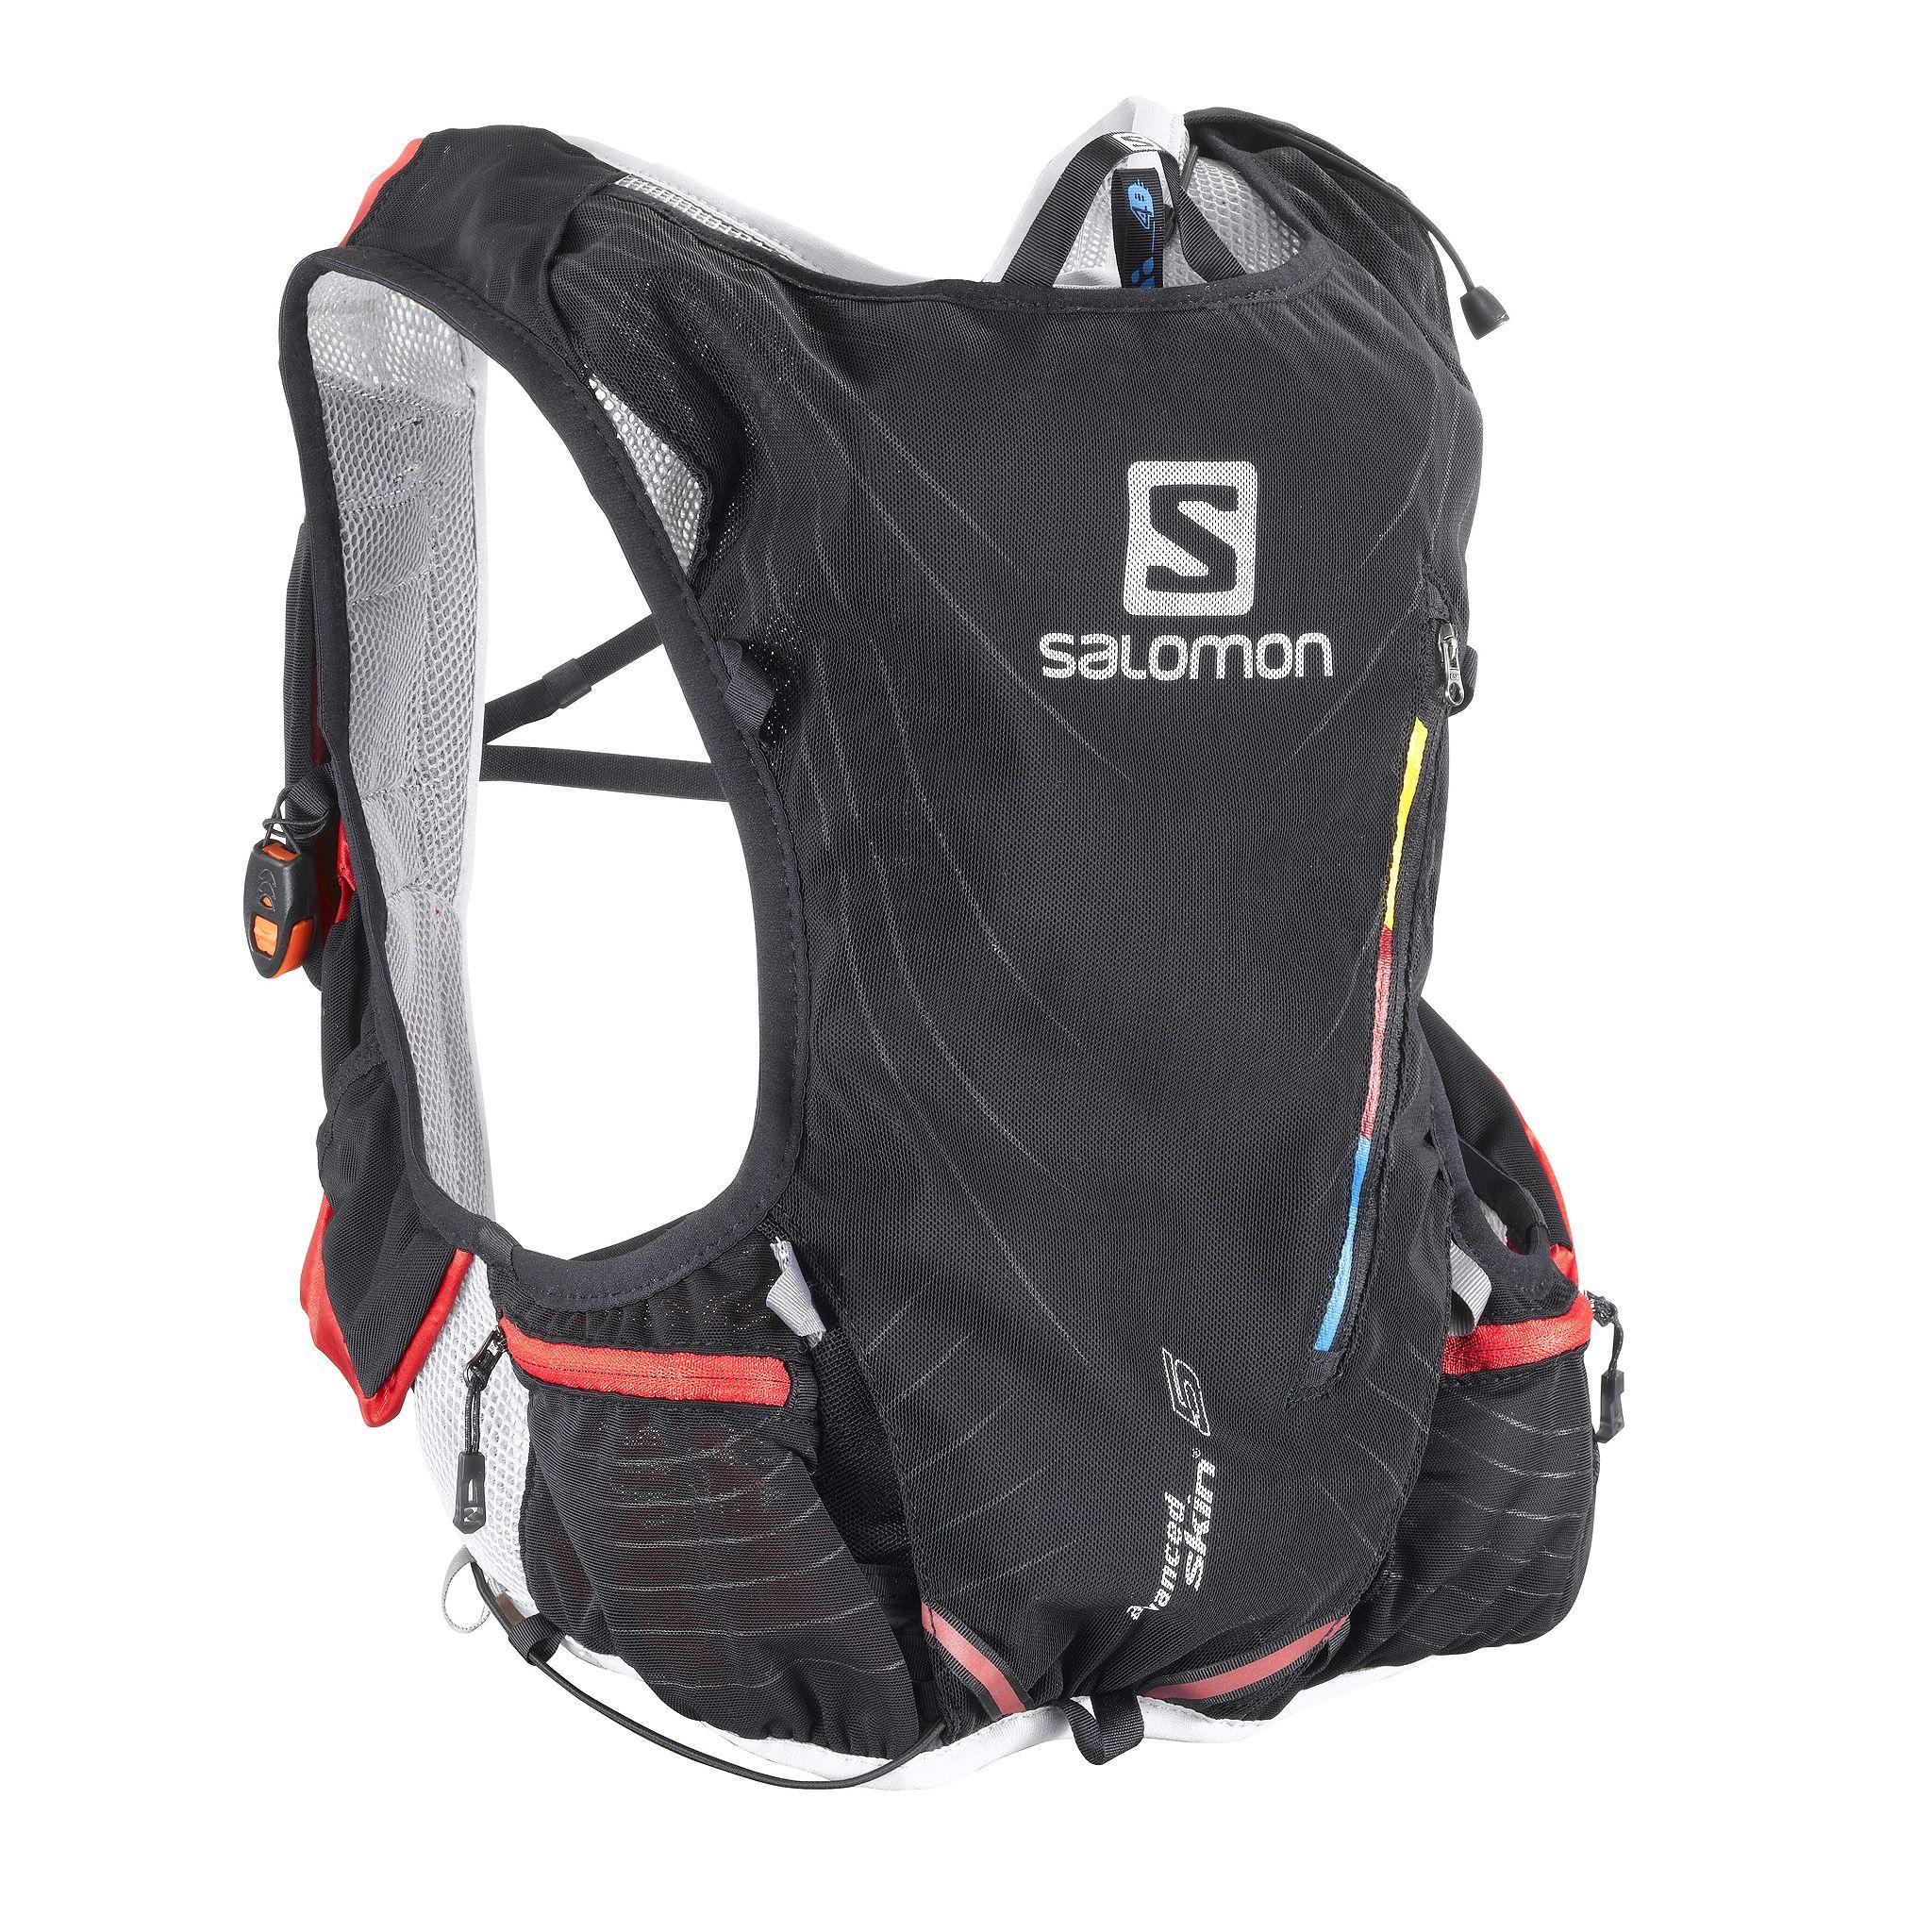 salomon Et Salomon Vert A Dos Noir Trail 20 Camelbak Sac 3ASRqcjL54